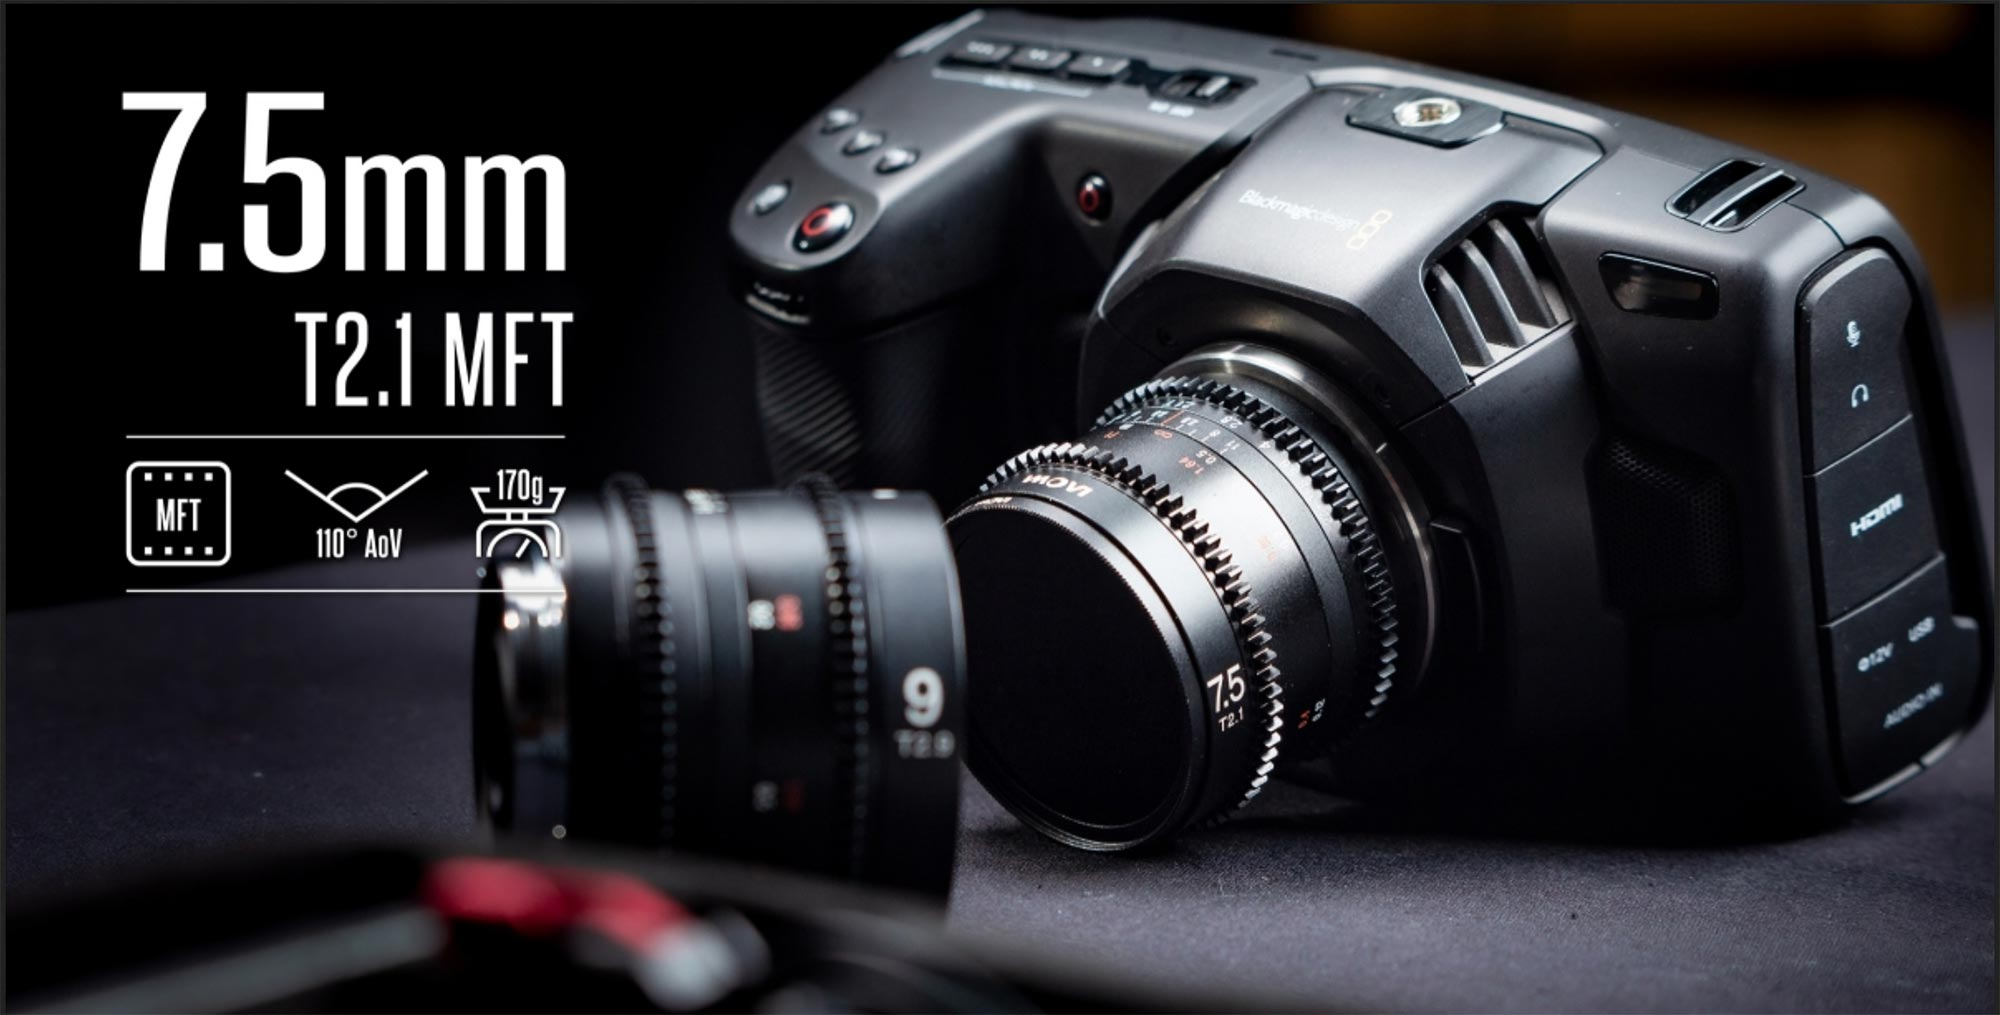 New Laowa Cine lenses for MFT, Super 35 and large format cinema cameras